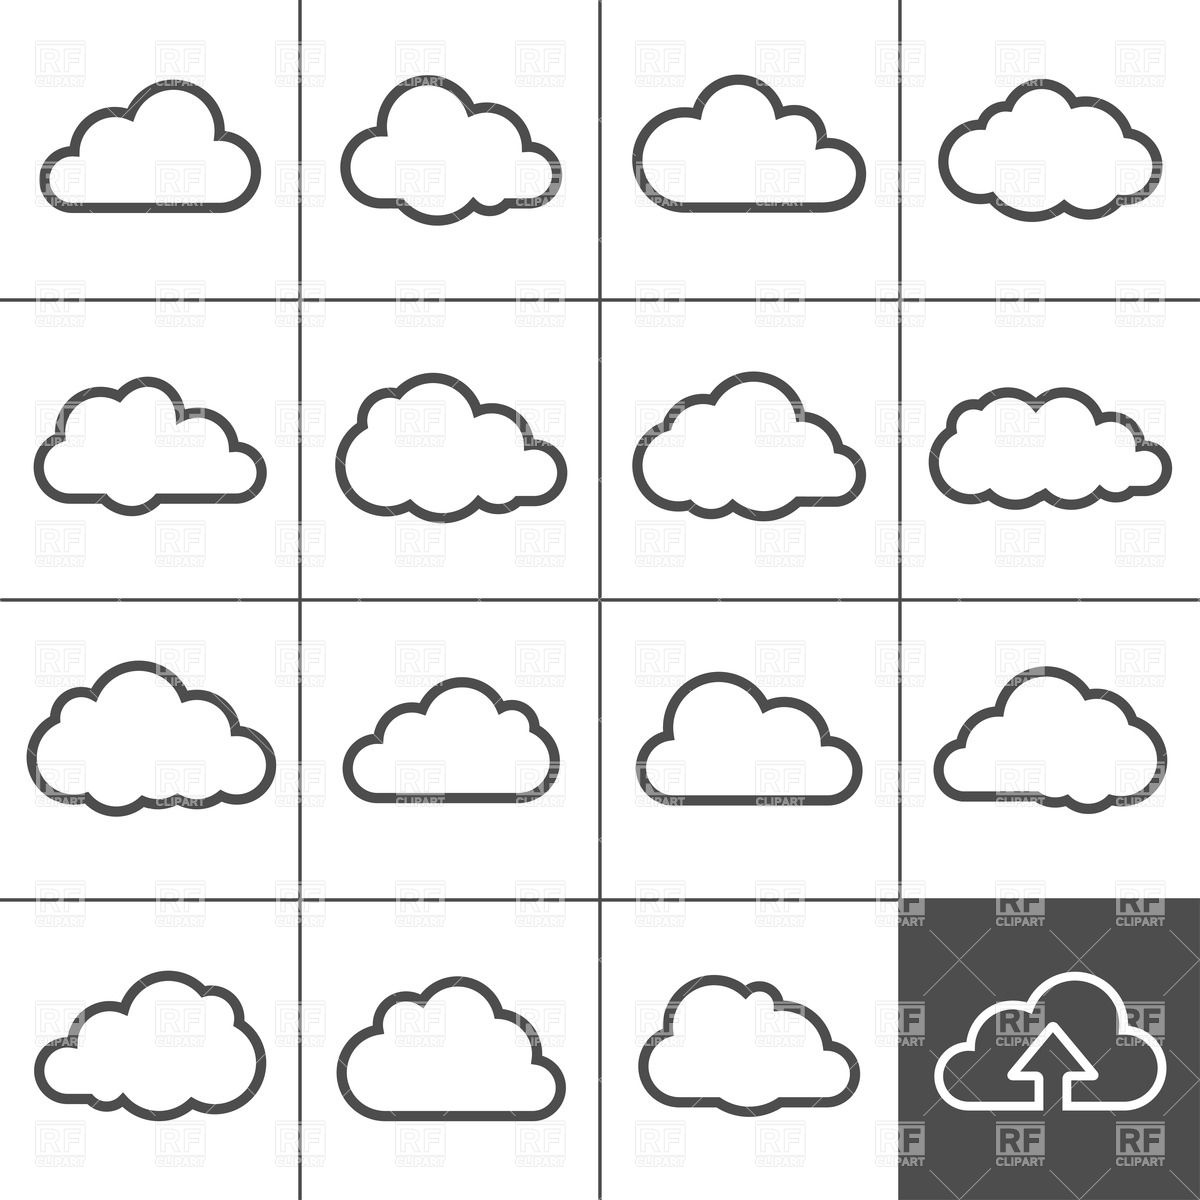 Cloud Shapes Clipart - Clipart Kid